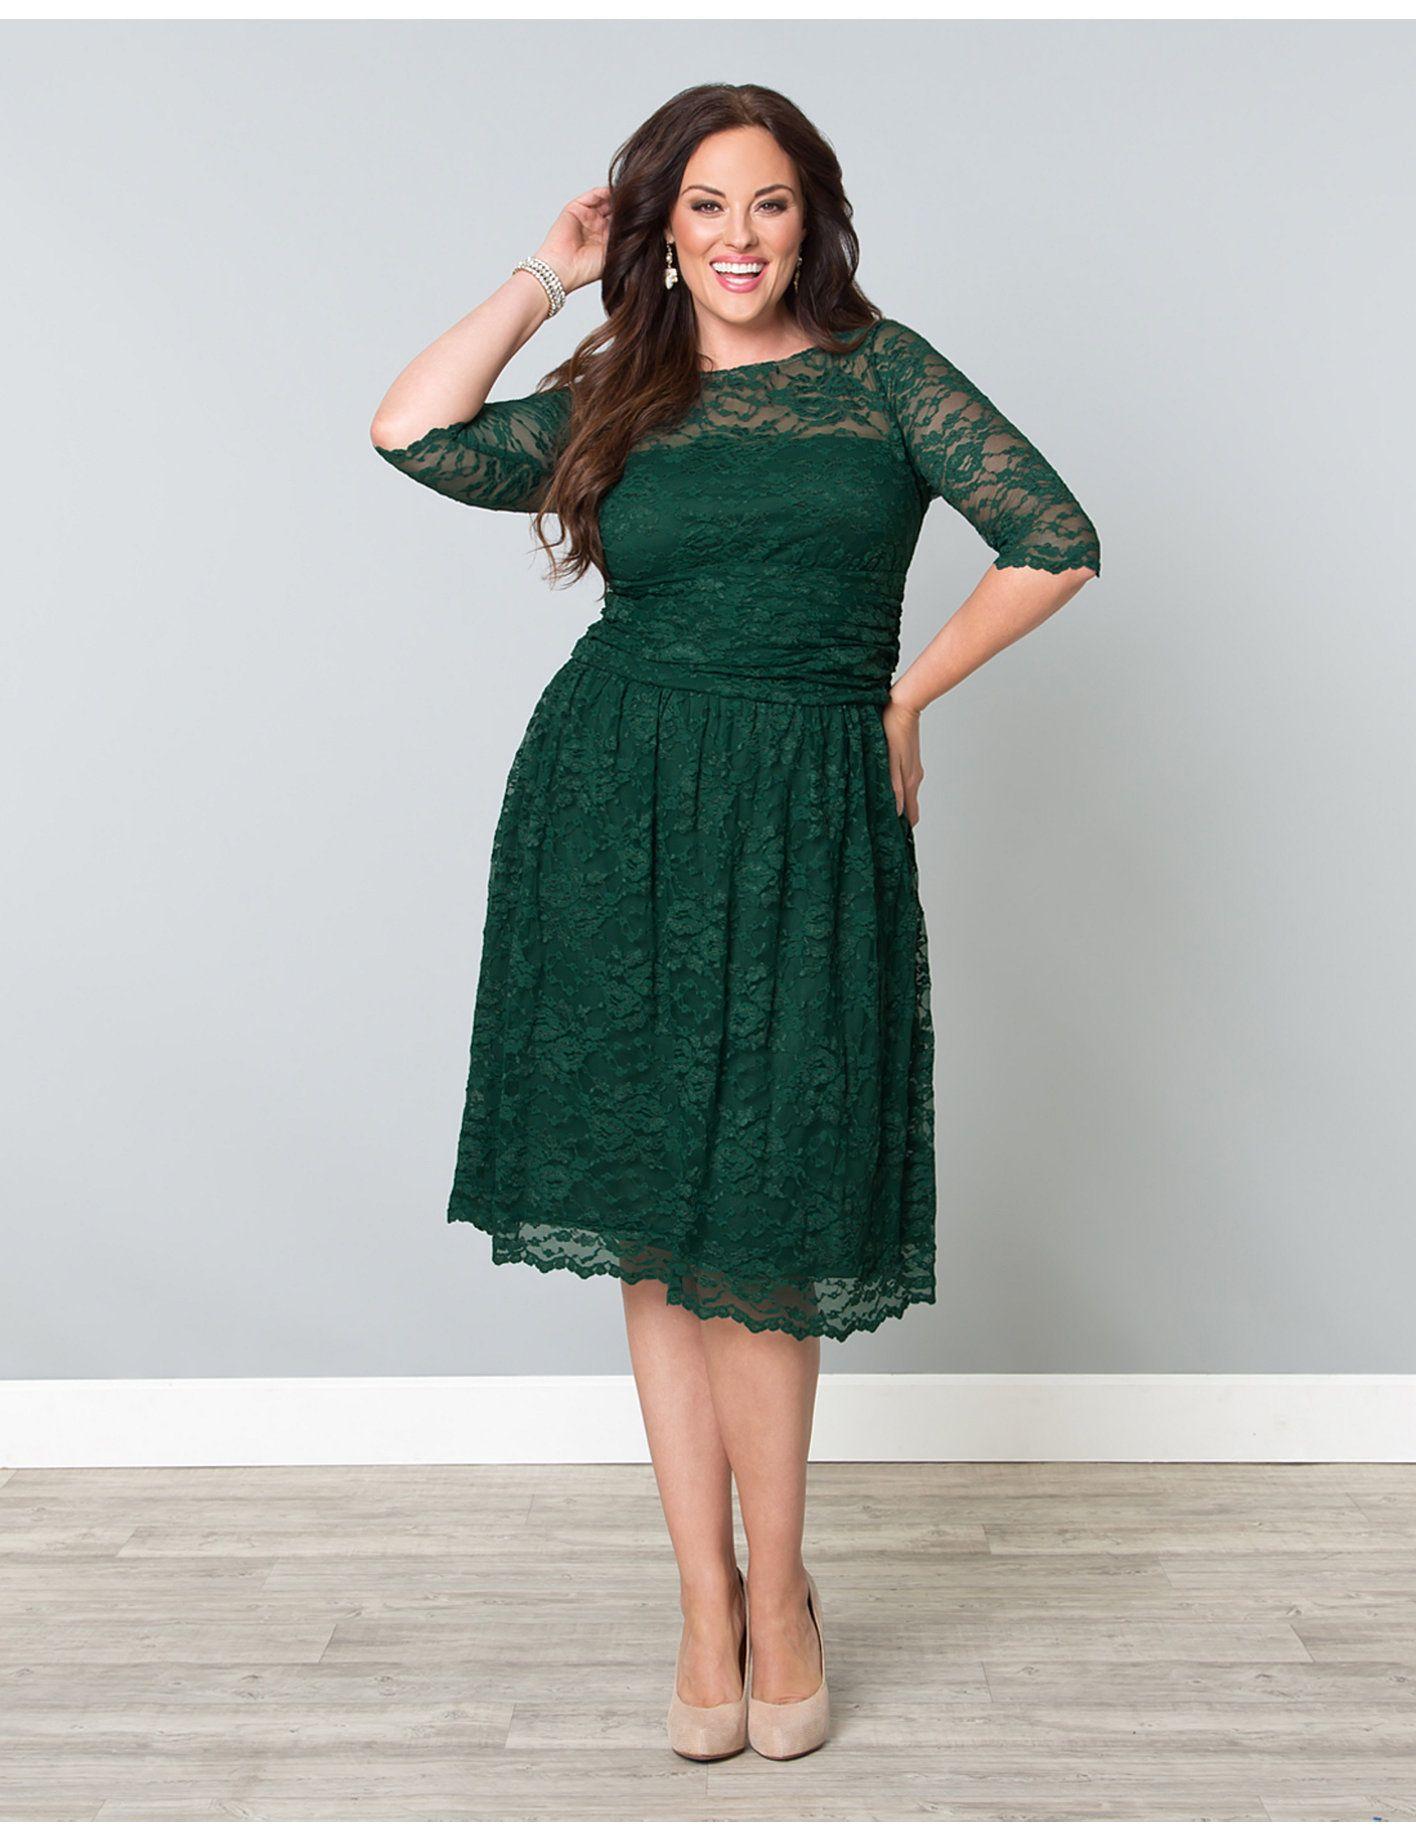 Plus Size Dresses Skirts For Women Size 14 28 Lane Bryant Bridesmaid Dresses Plus Size Lace Dress Bridesmaid Dresses With Sleeves